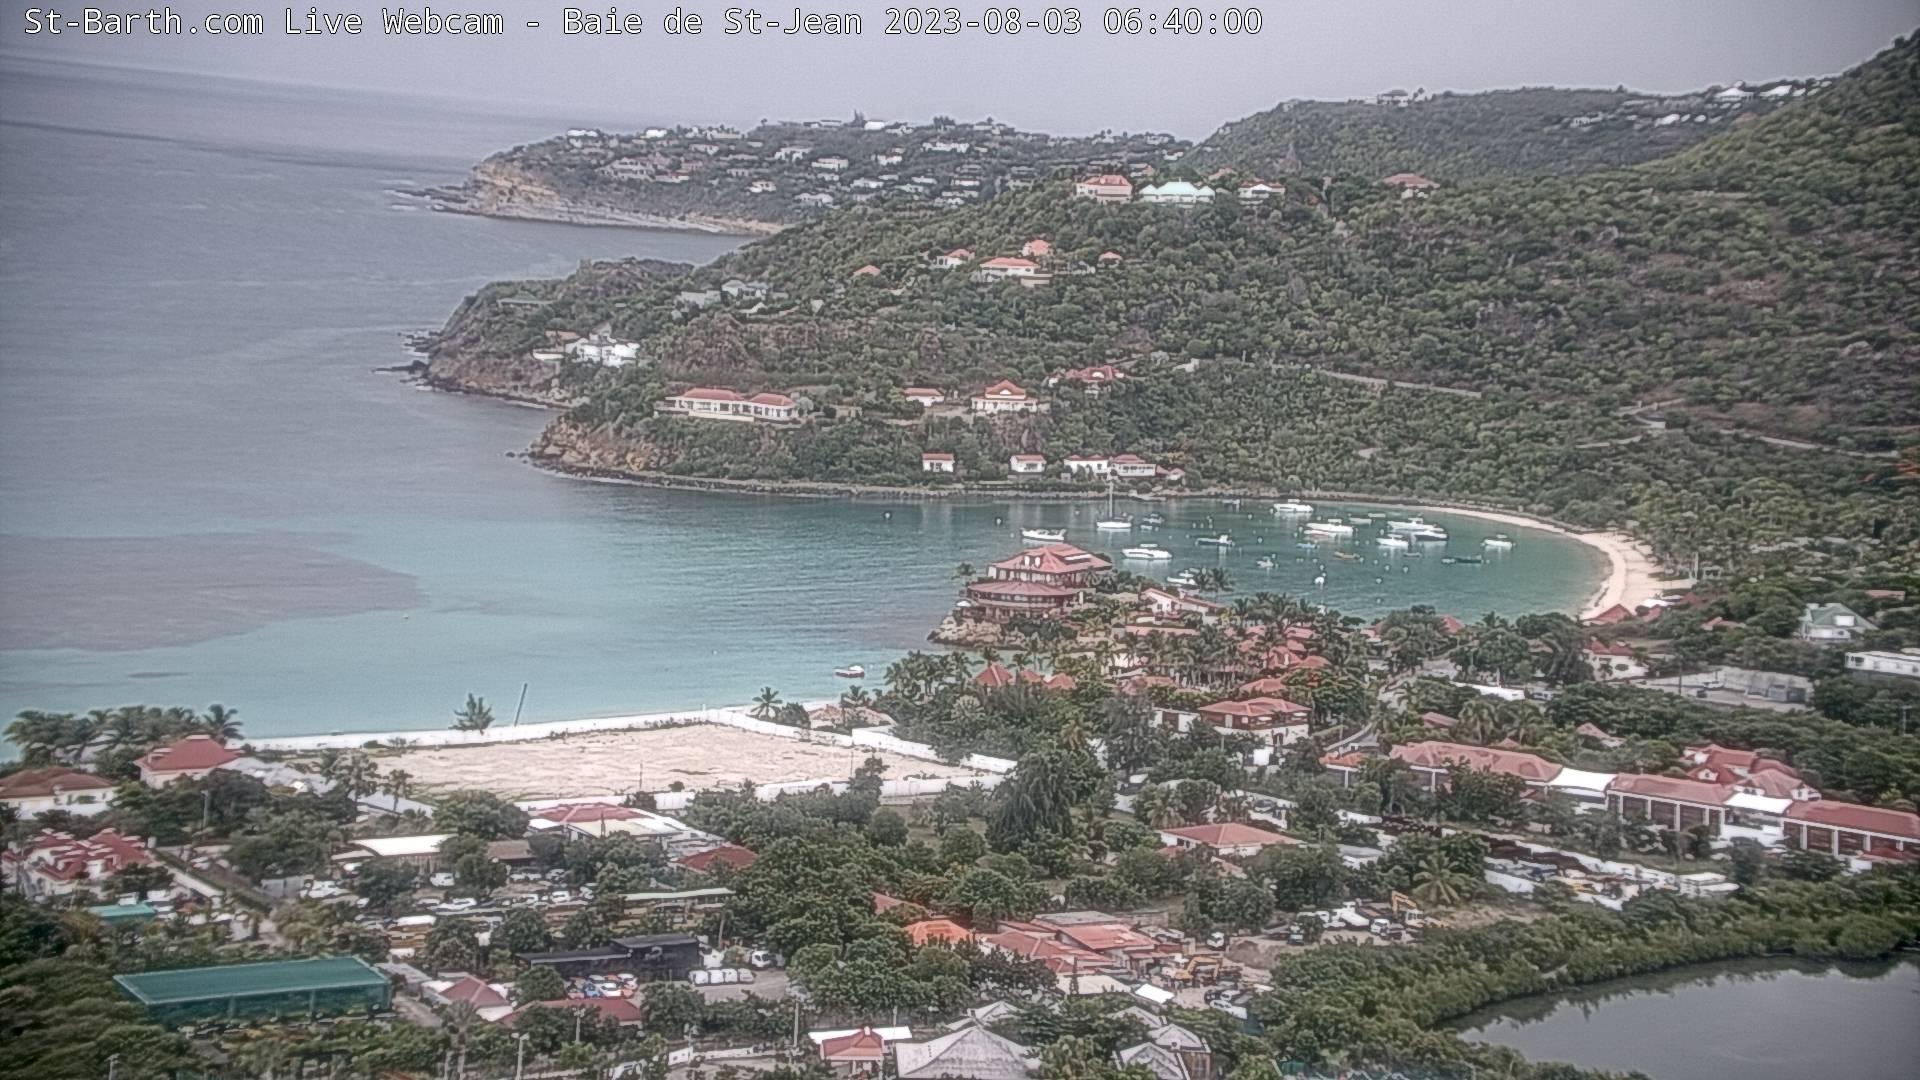 St Barth - St-Barth.com - Baie de St Jean - Webcam